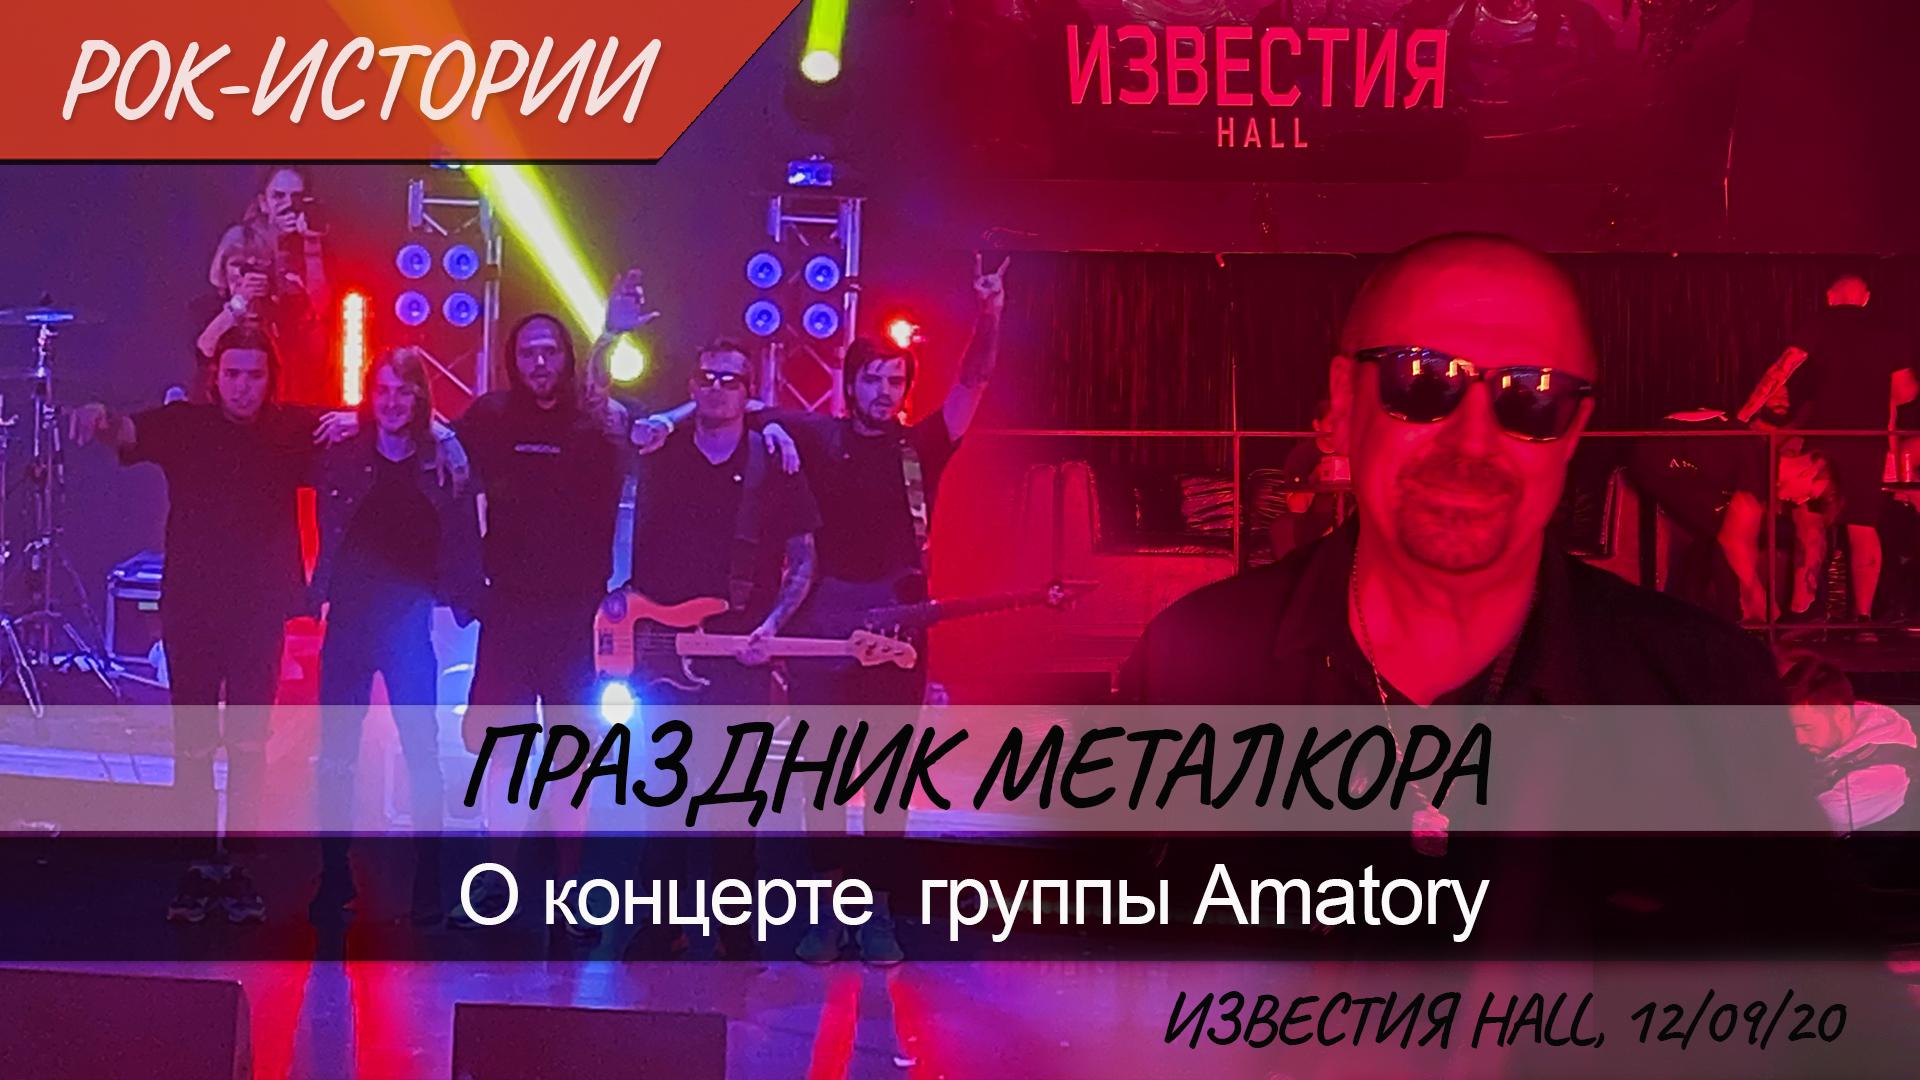 Рок-истории заглушка Amatory.jpg